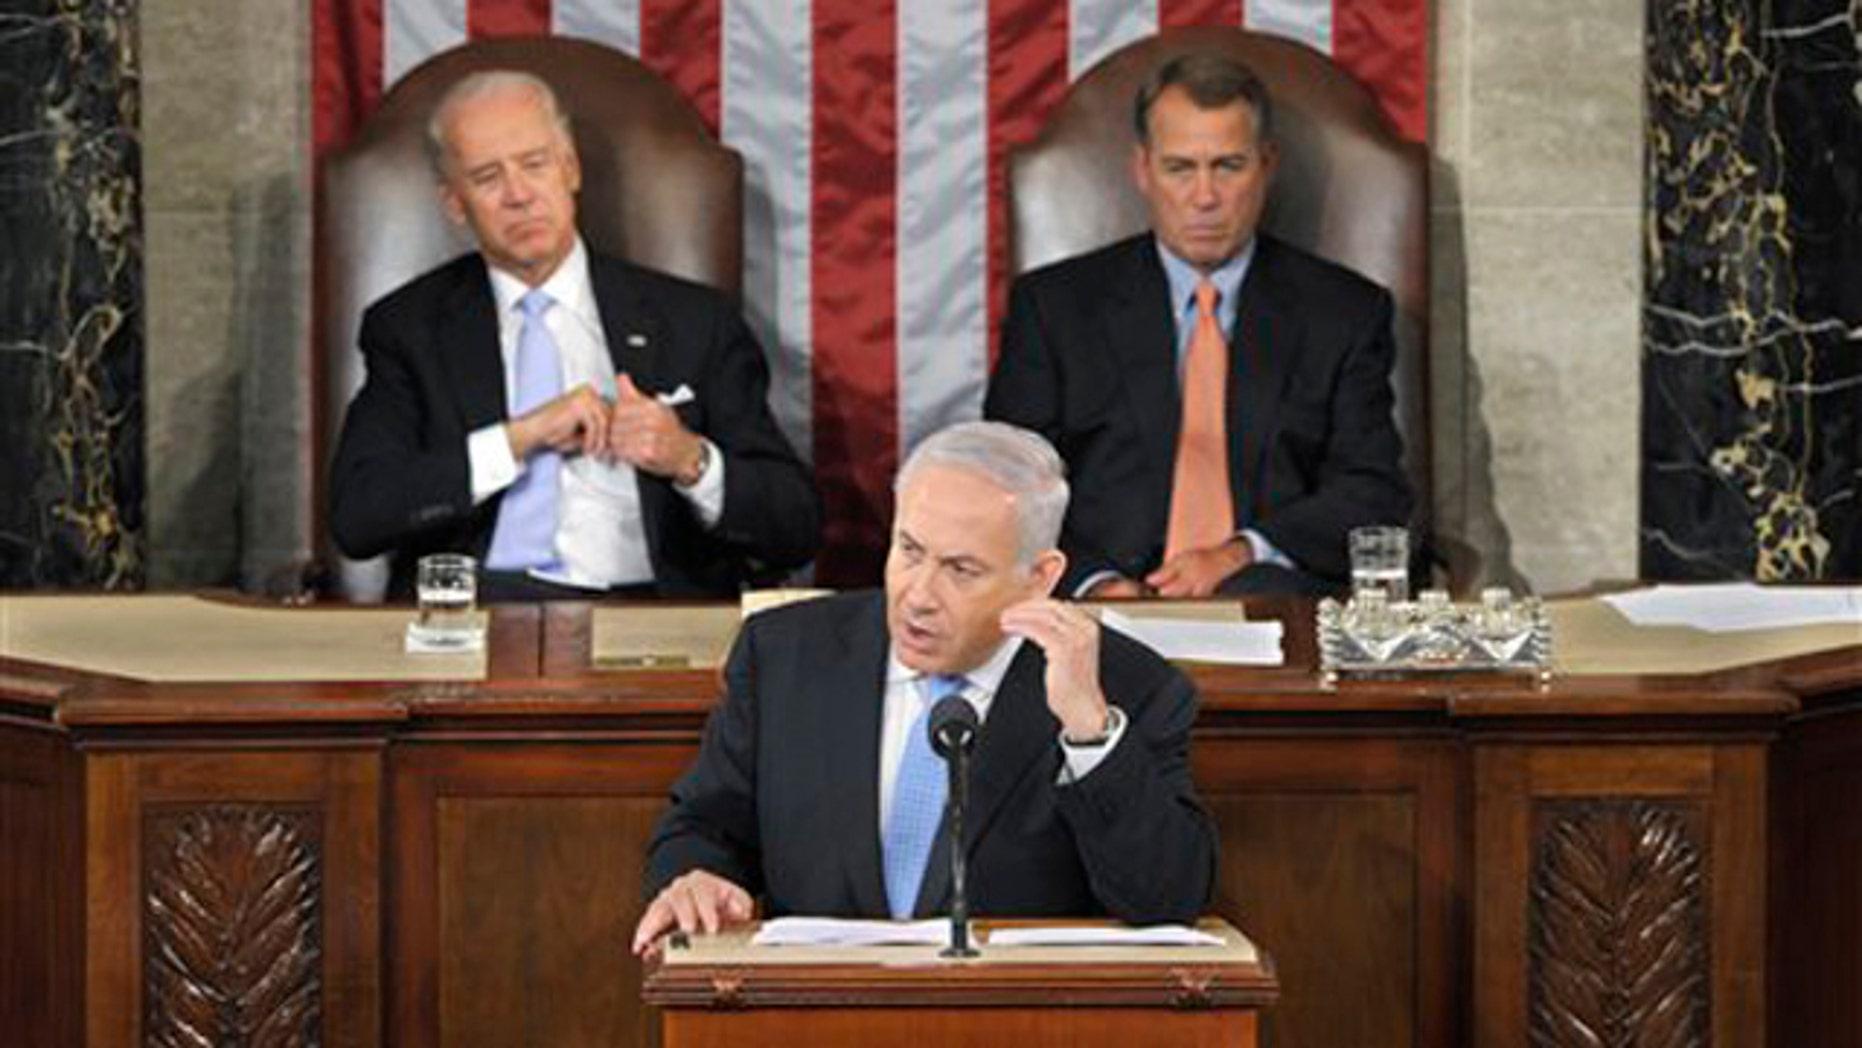 Israel's Prime Minister Benjamin Netanyahu gestures while addressing a joint meeting of Congress in Washington May 24. House Speaker John Boehner, right, and Vice President Joe Biden listen.